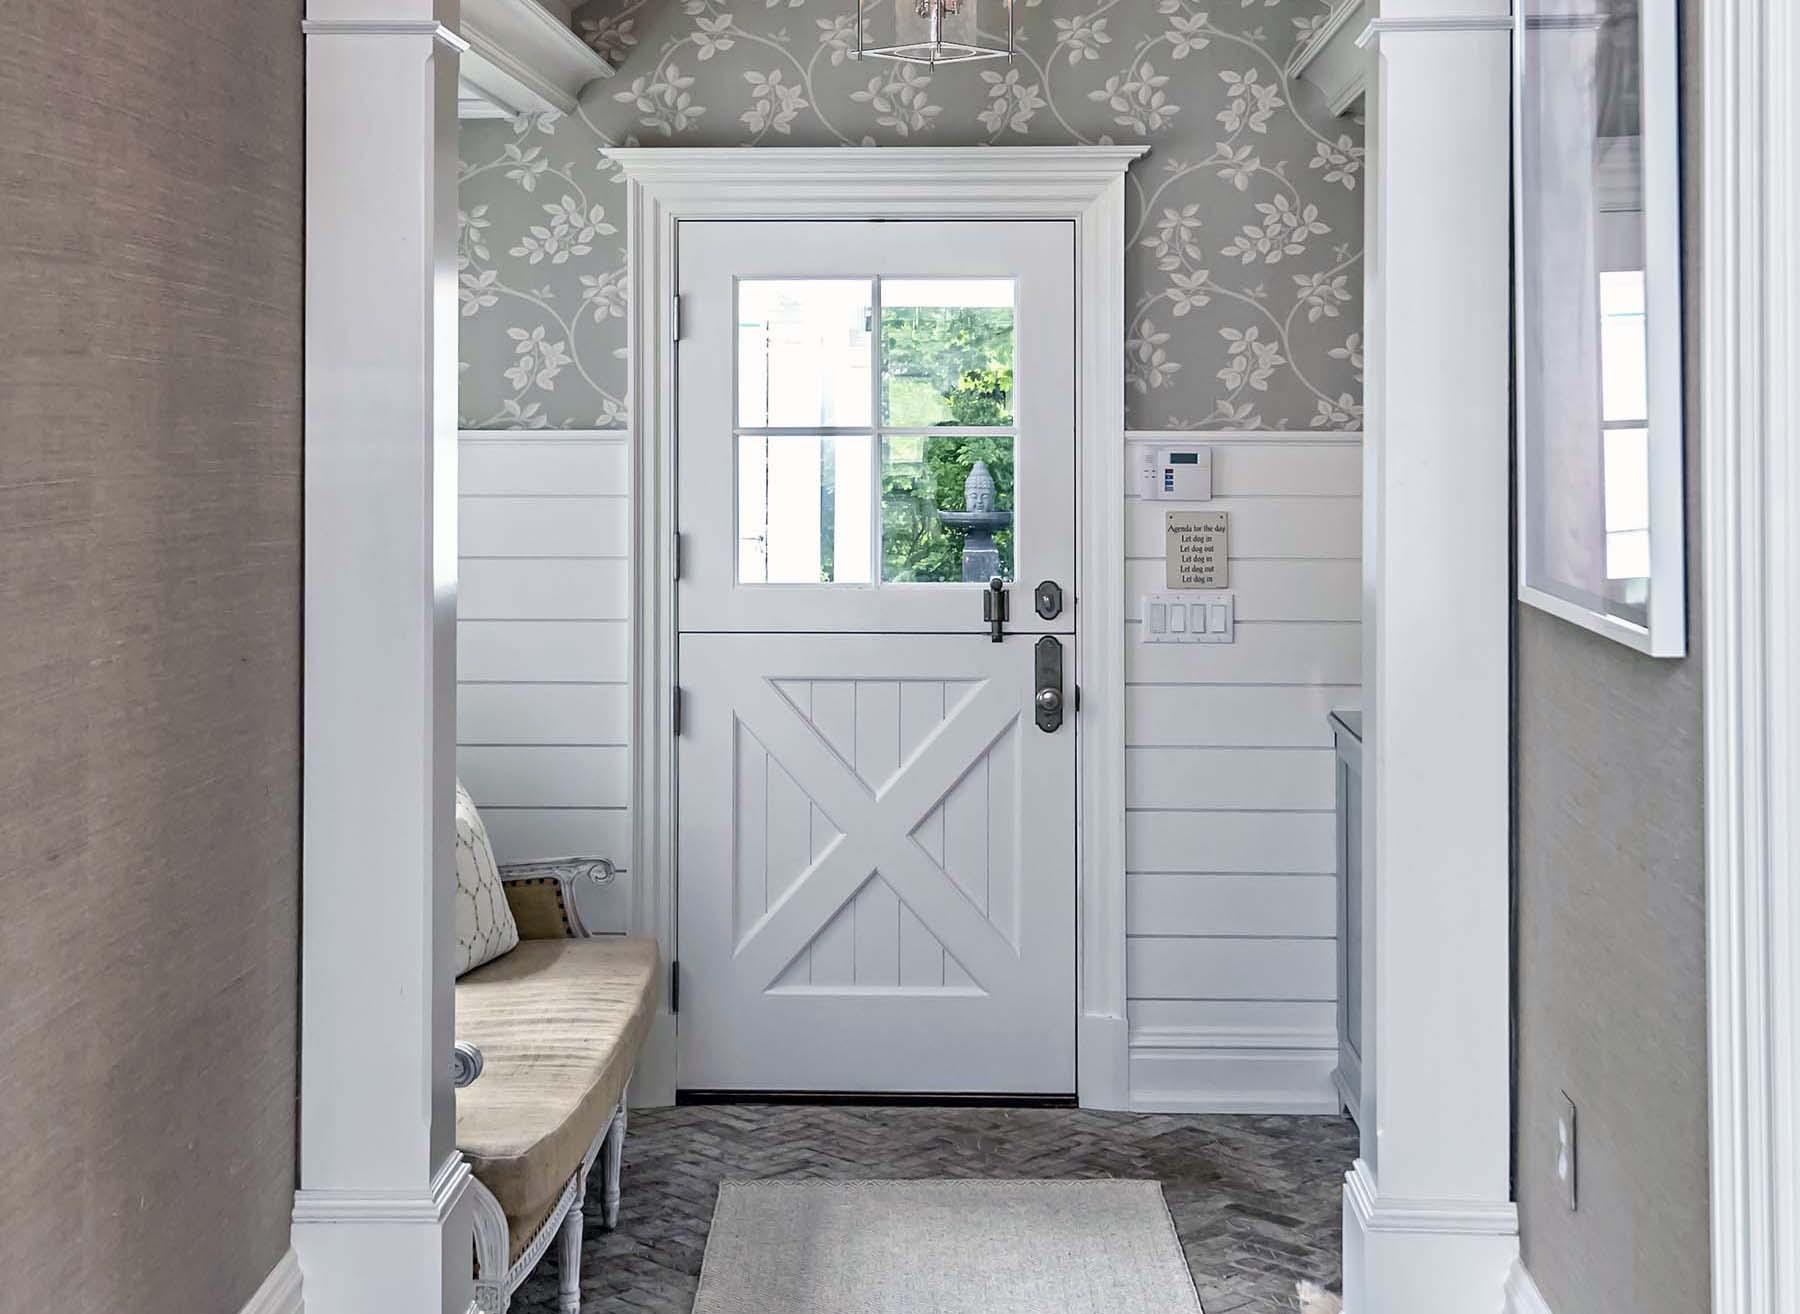 12 Best Small Entryway Design Ideas | Top Small Foyer Ideas ...